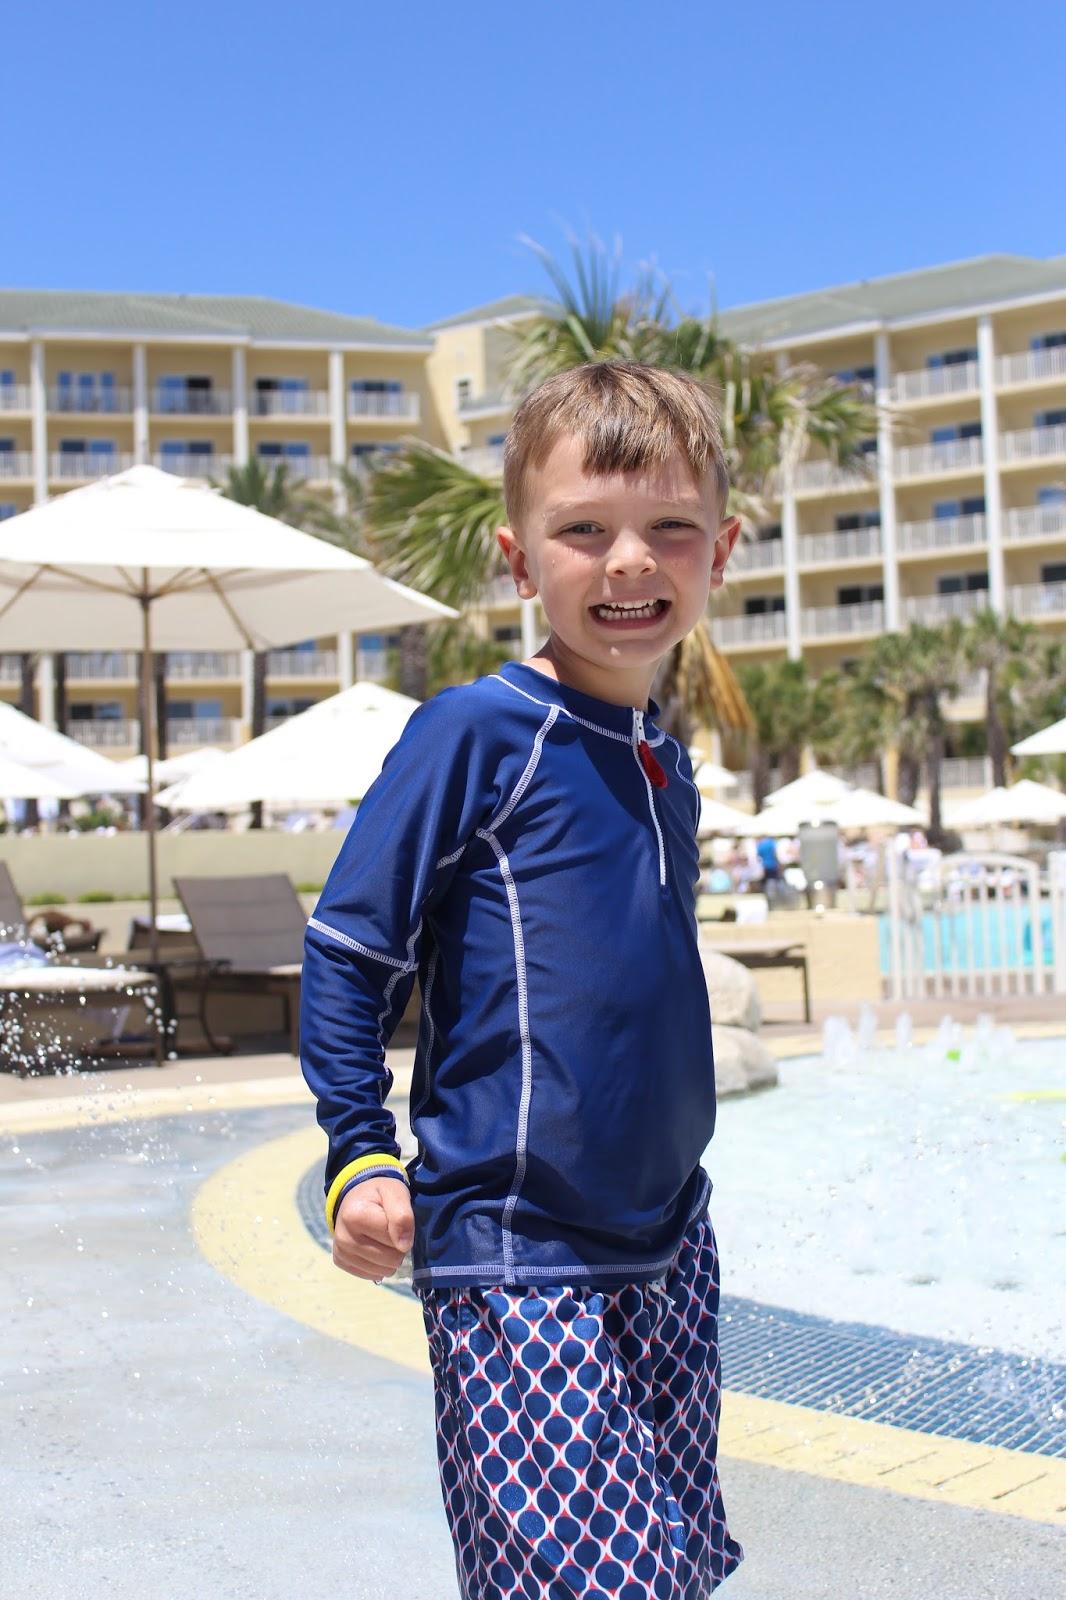 Omni Amelia Island Plantation Family Vacation Tips, Stilettos and Diapers